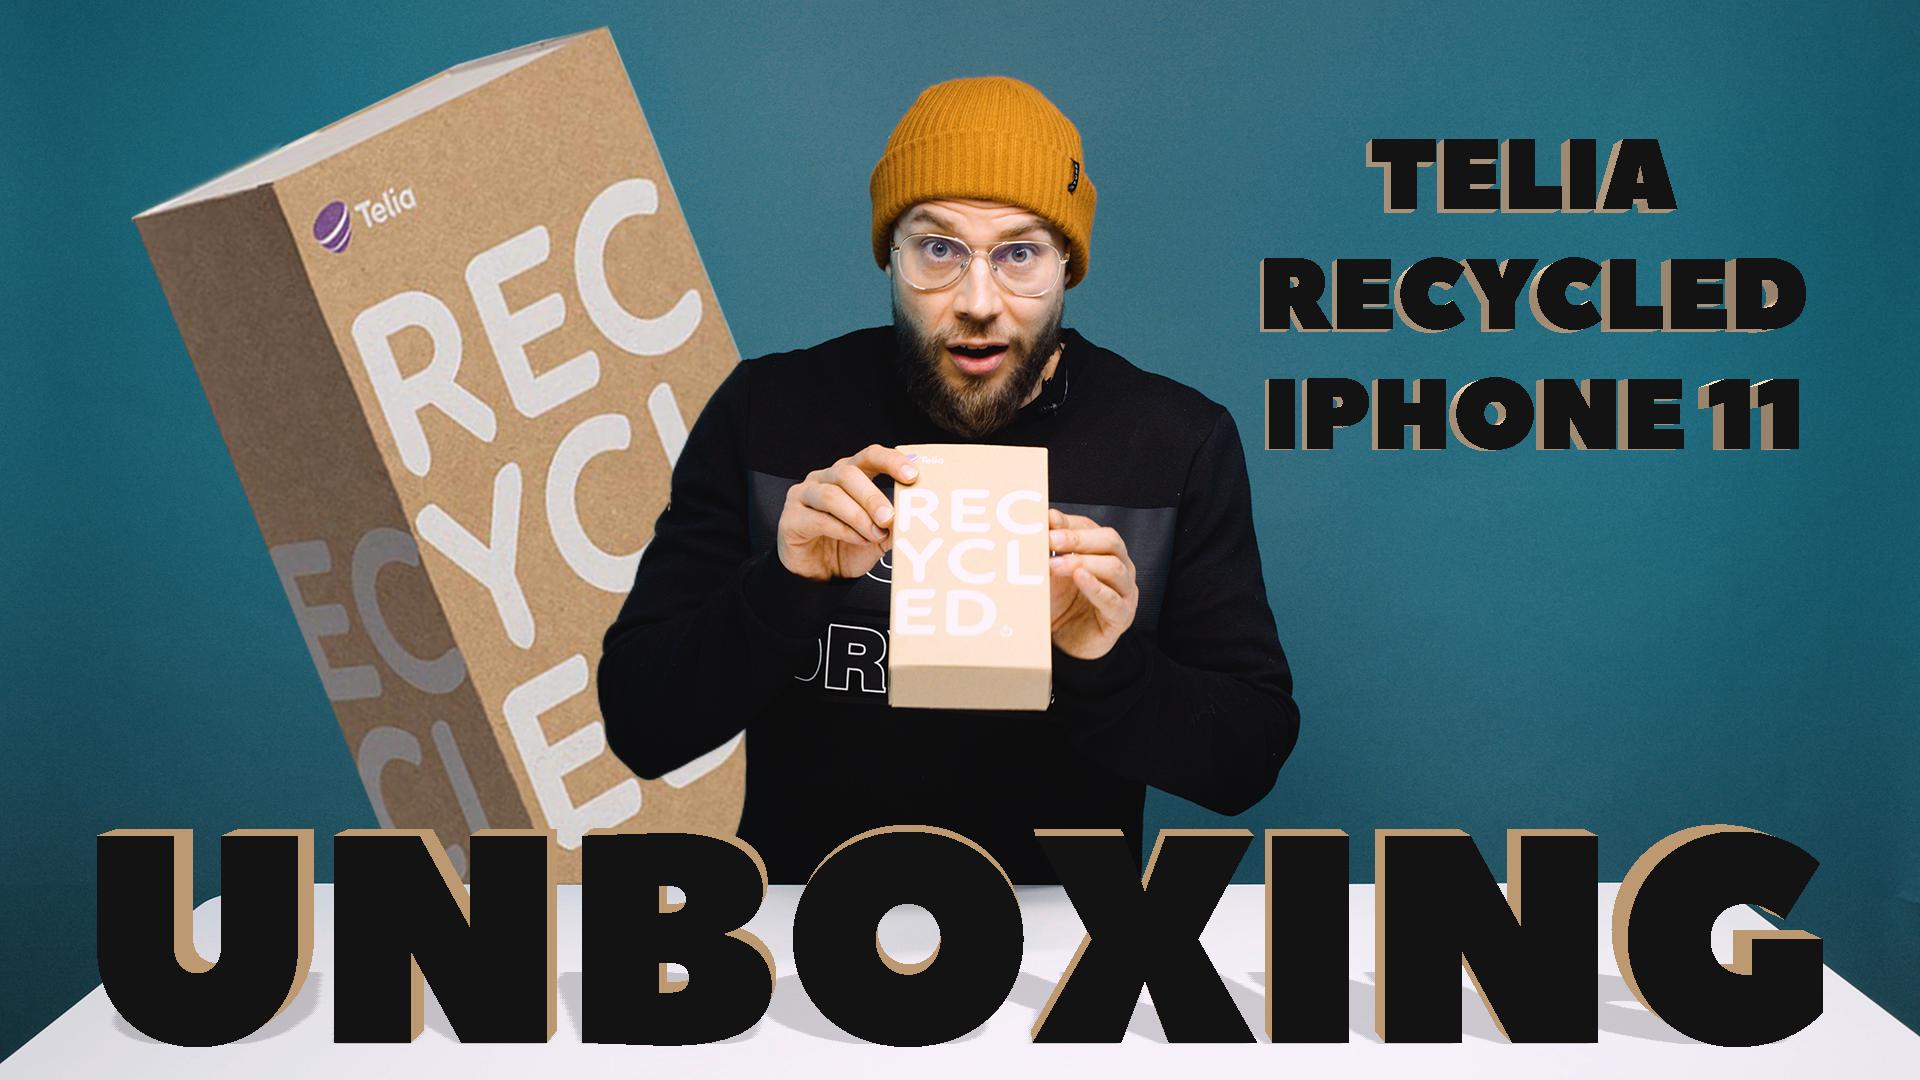 Telia Recycled UNBOXING